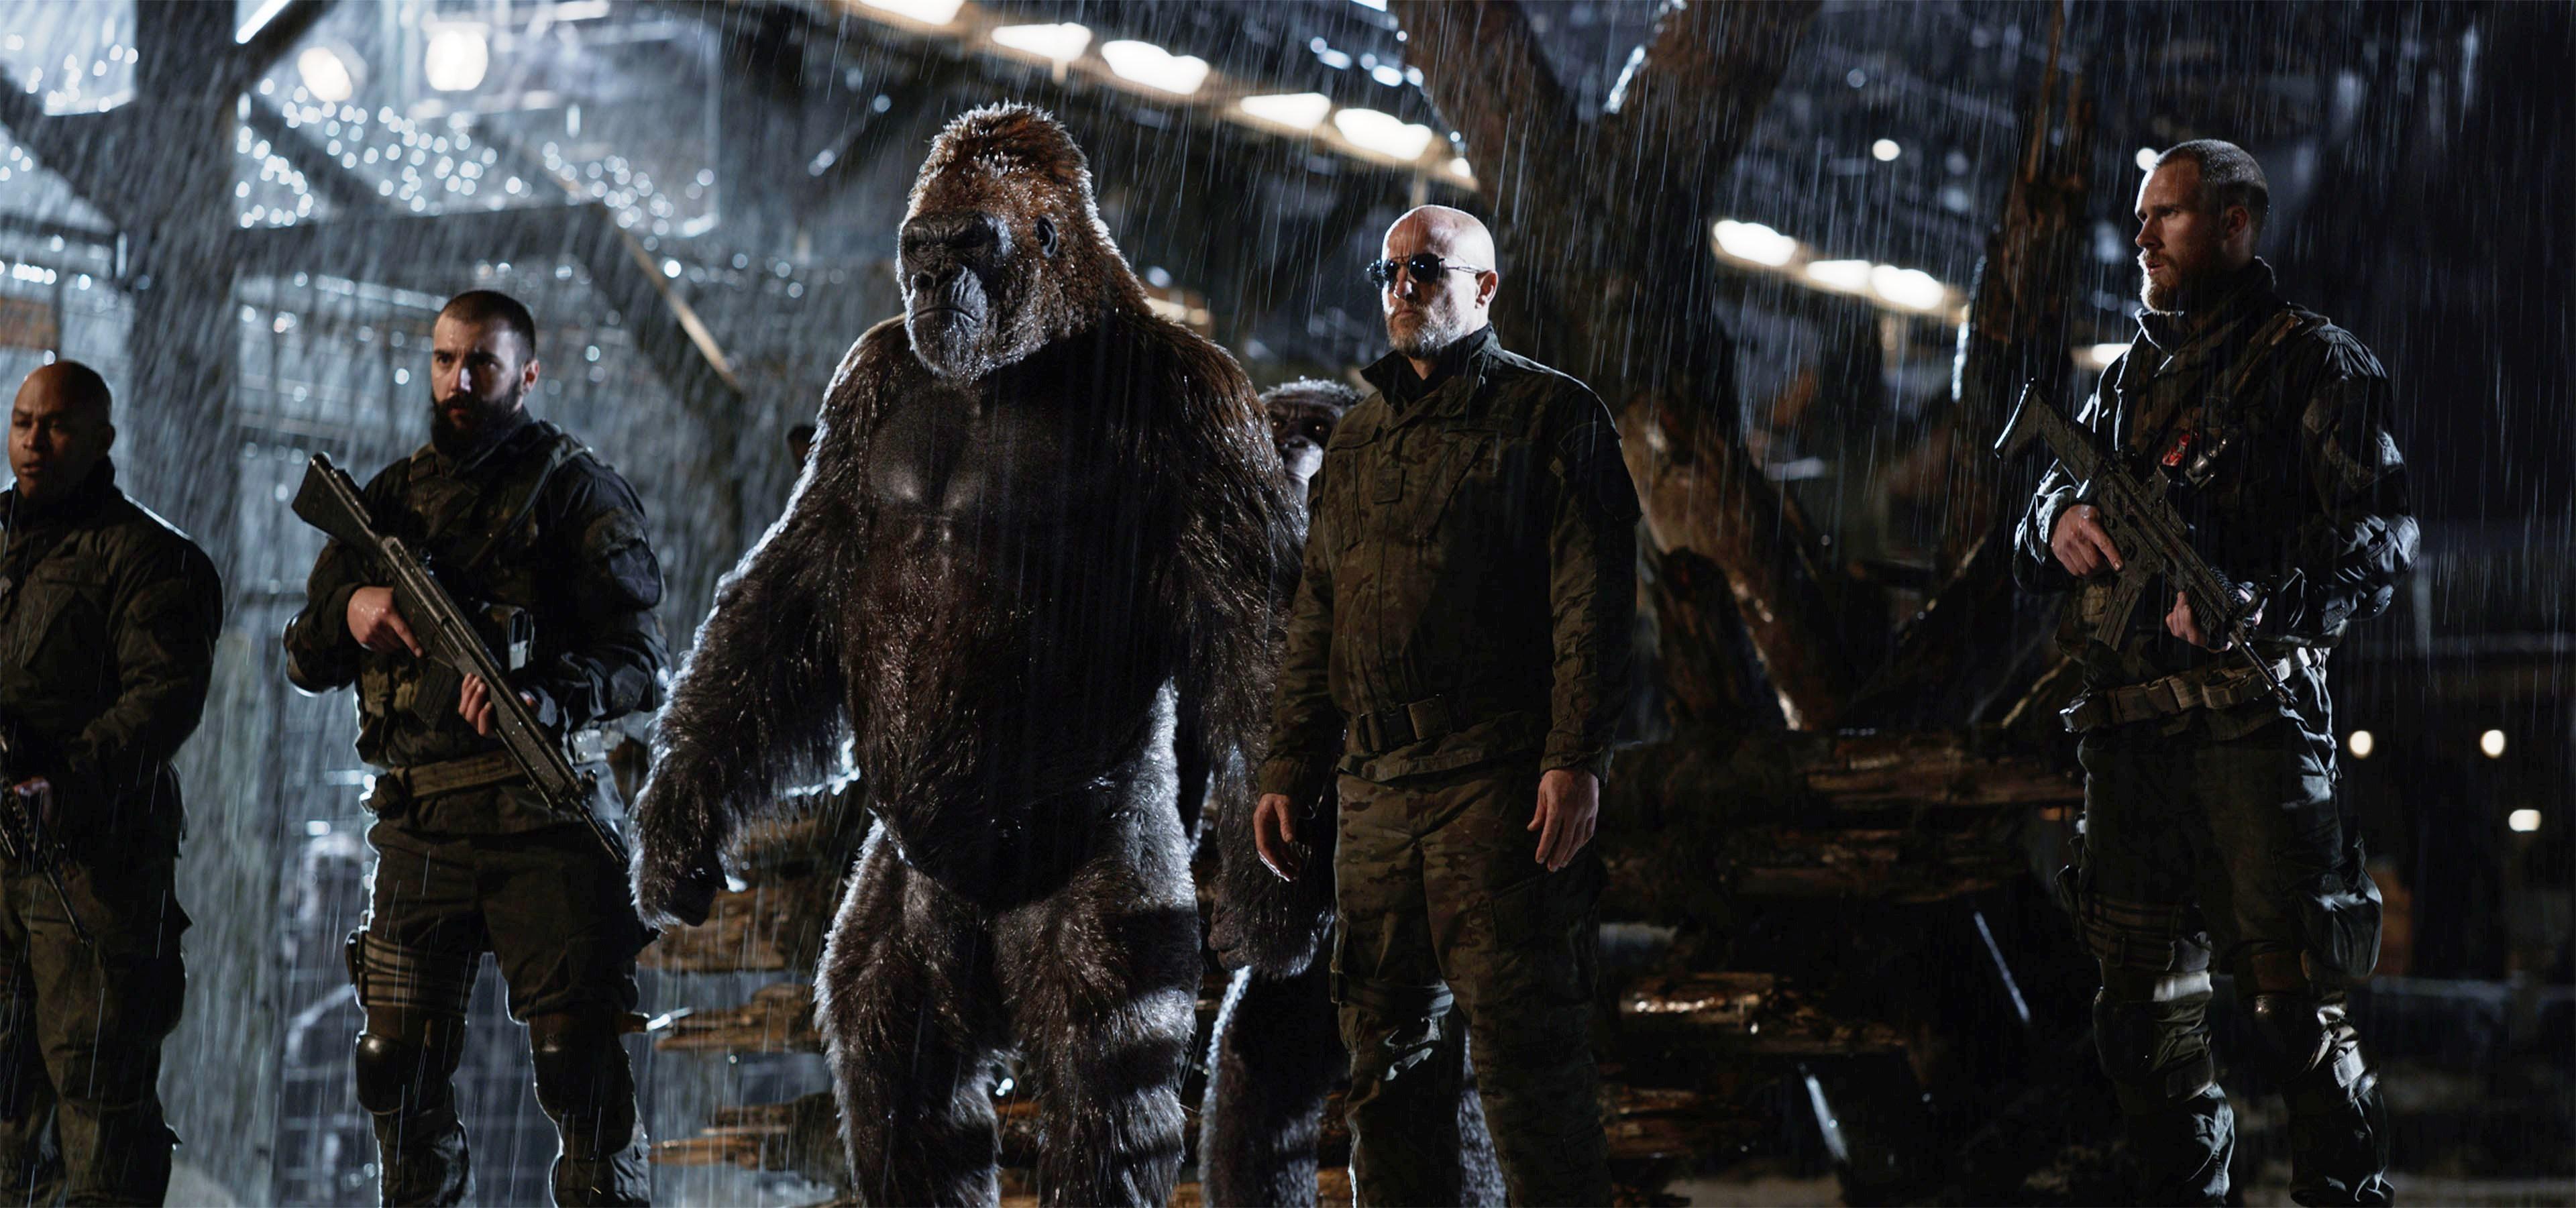 «Планета обезьян: Война» — лучший «Варкрафт», чем сам «Варкрафт» 5